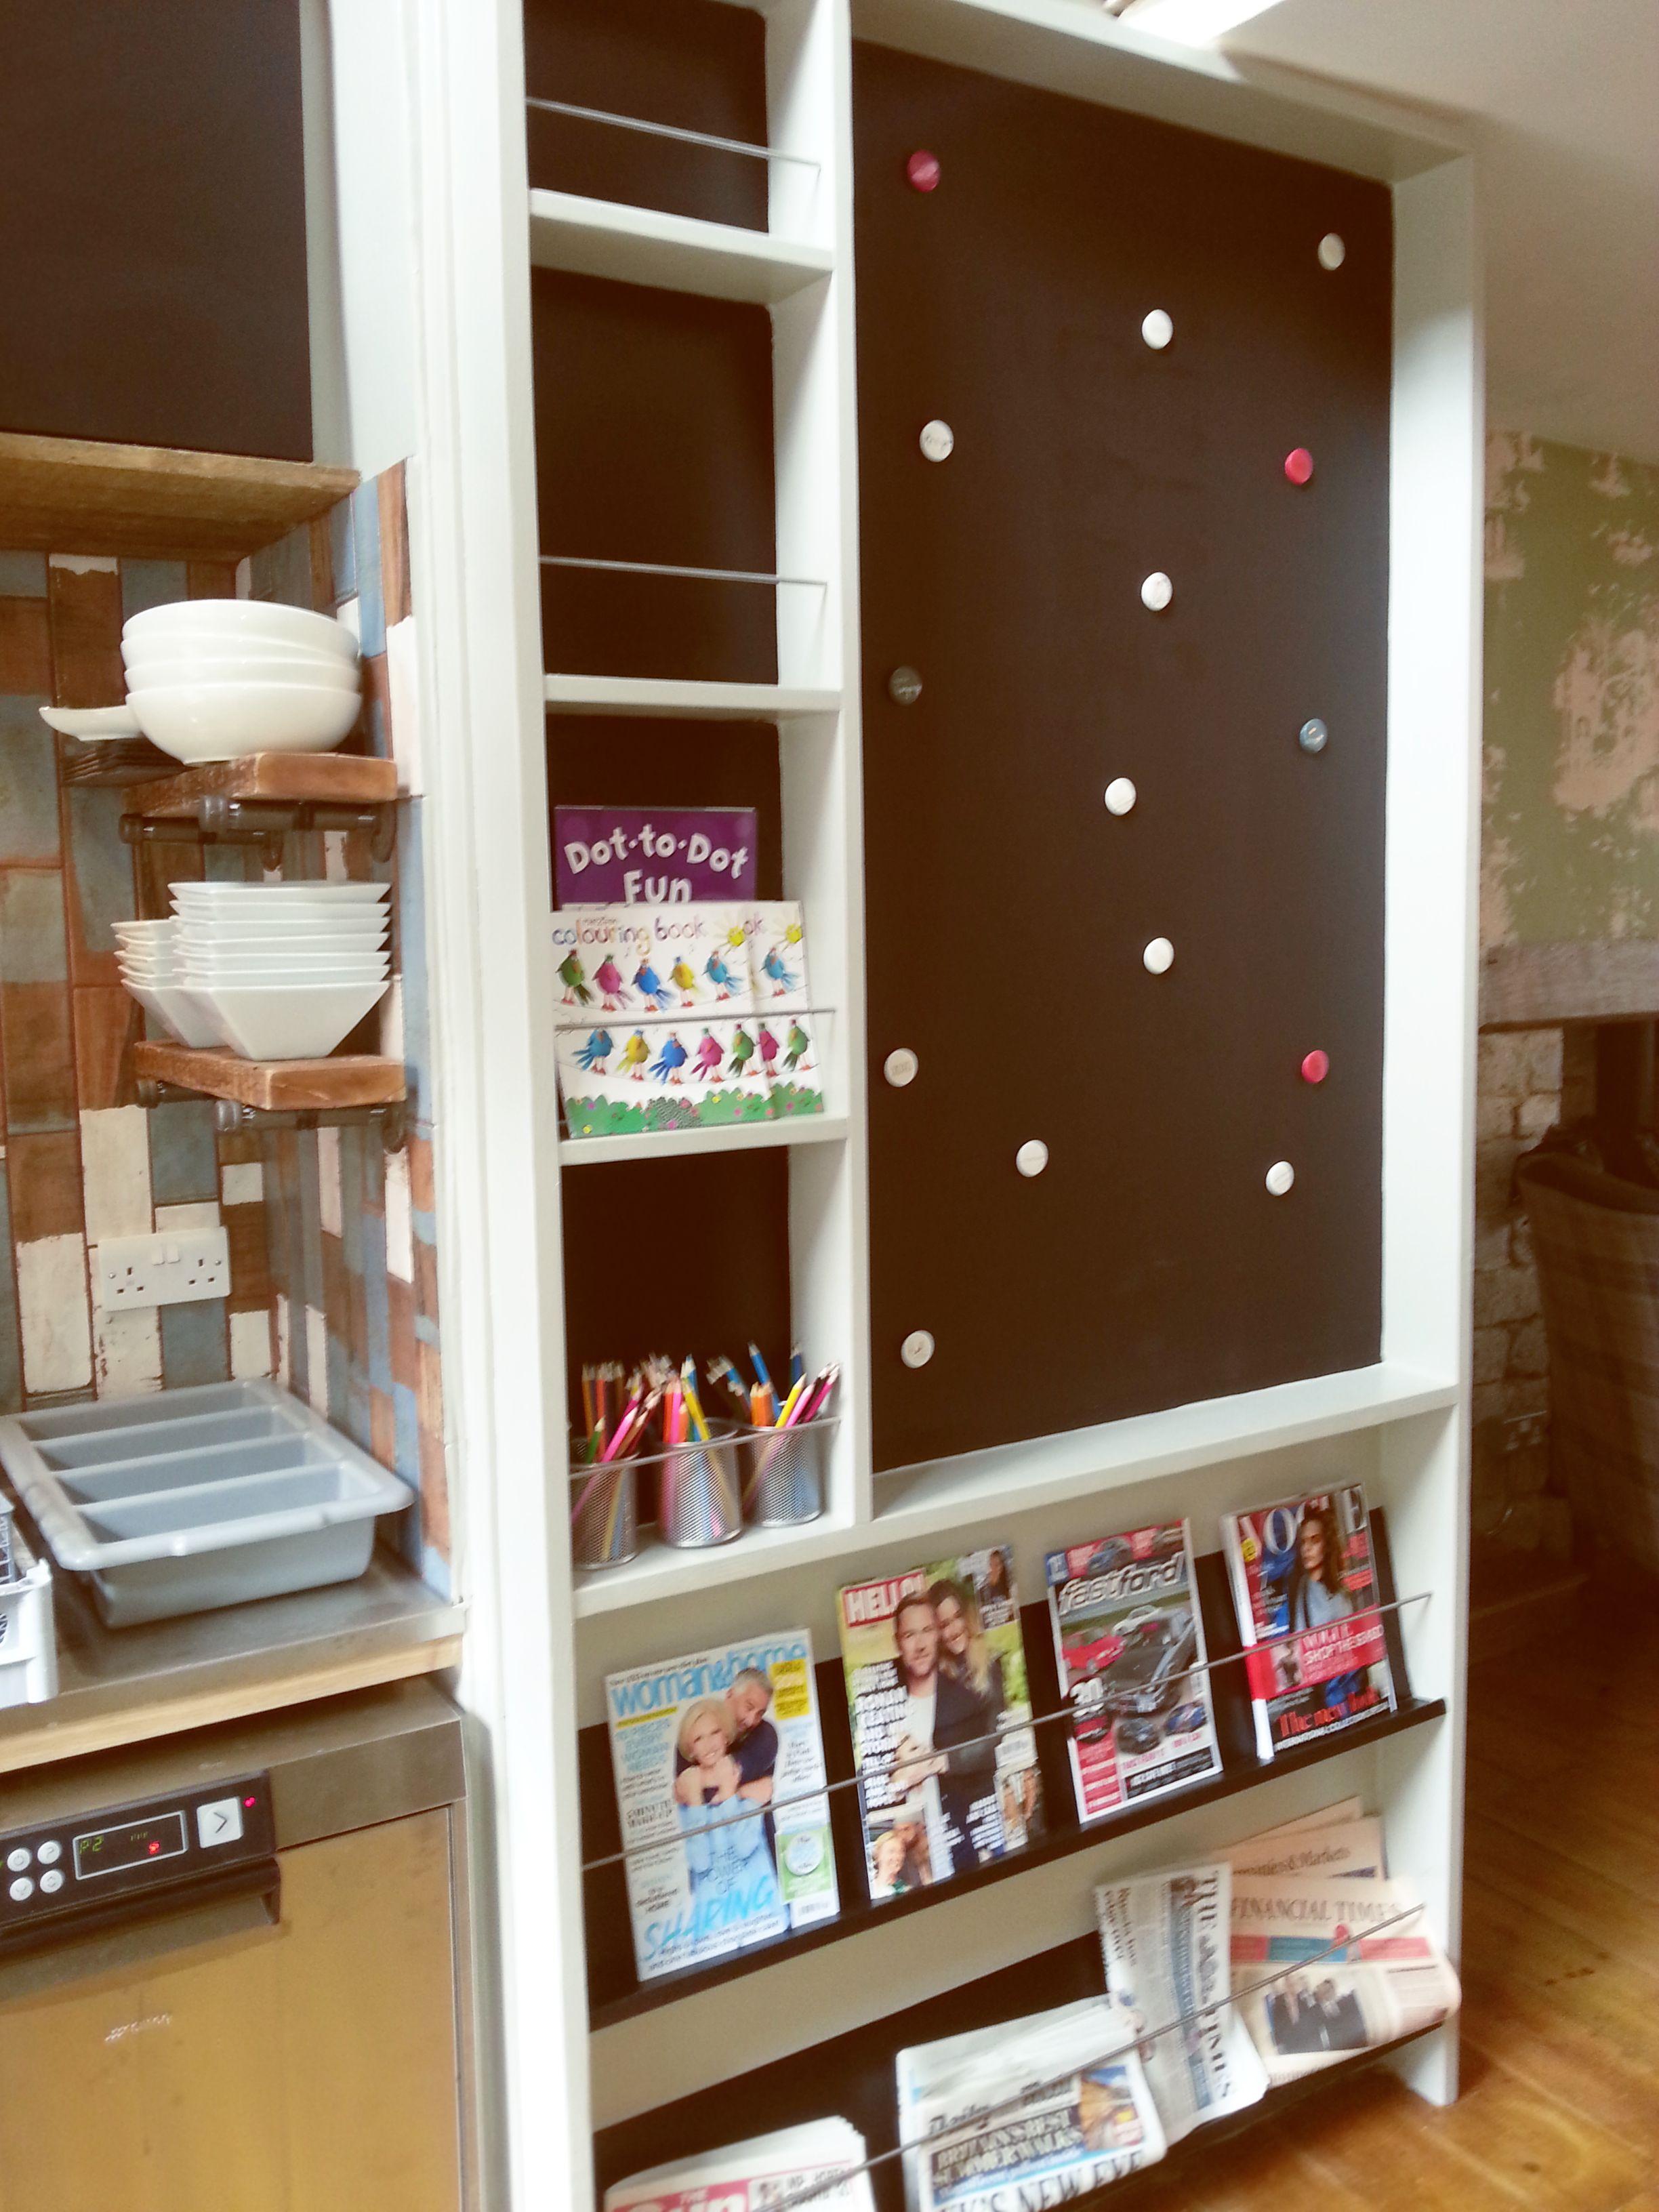 ESQUIRES COFFEE   BUCKINGHAM Playful Chalkboard  Kidsu0027 Corner